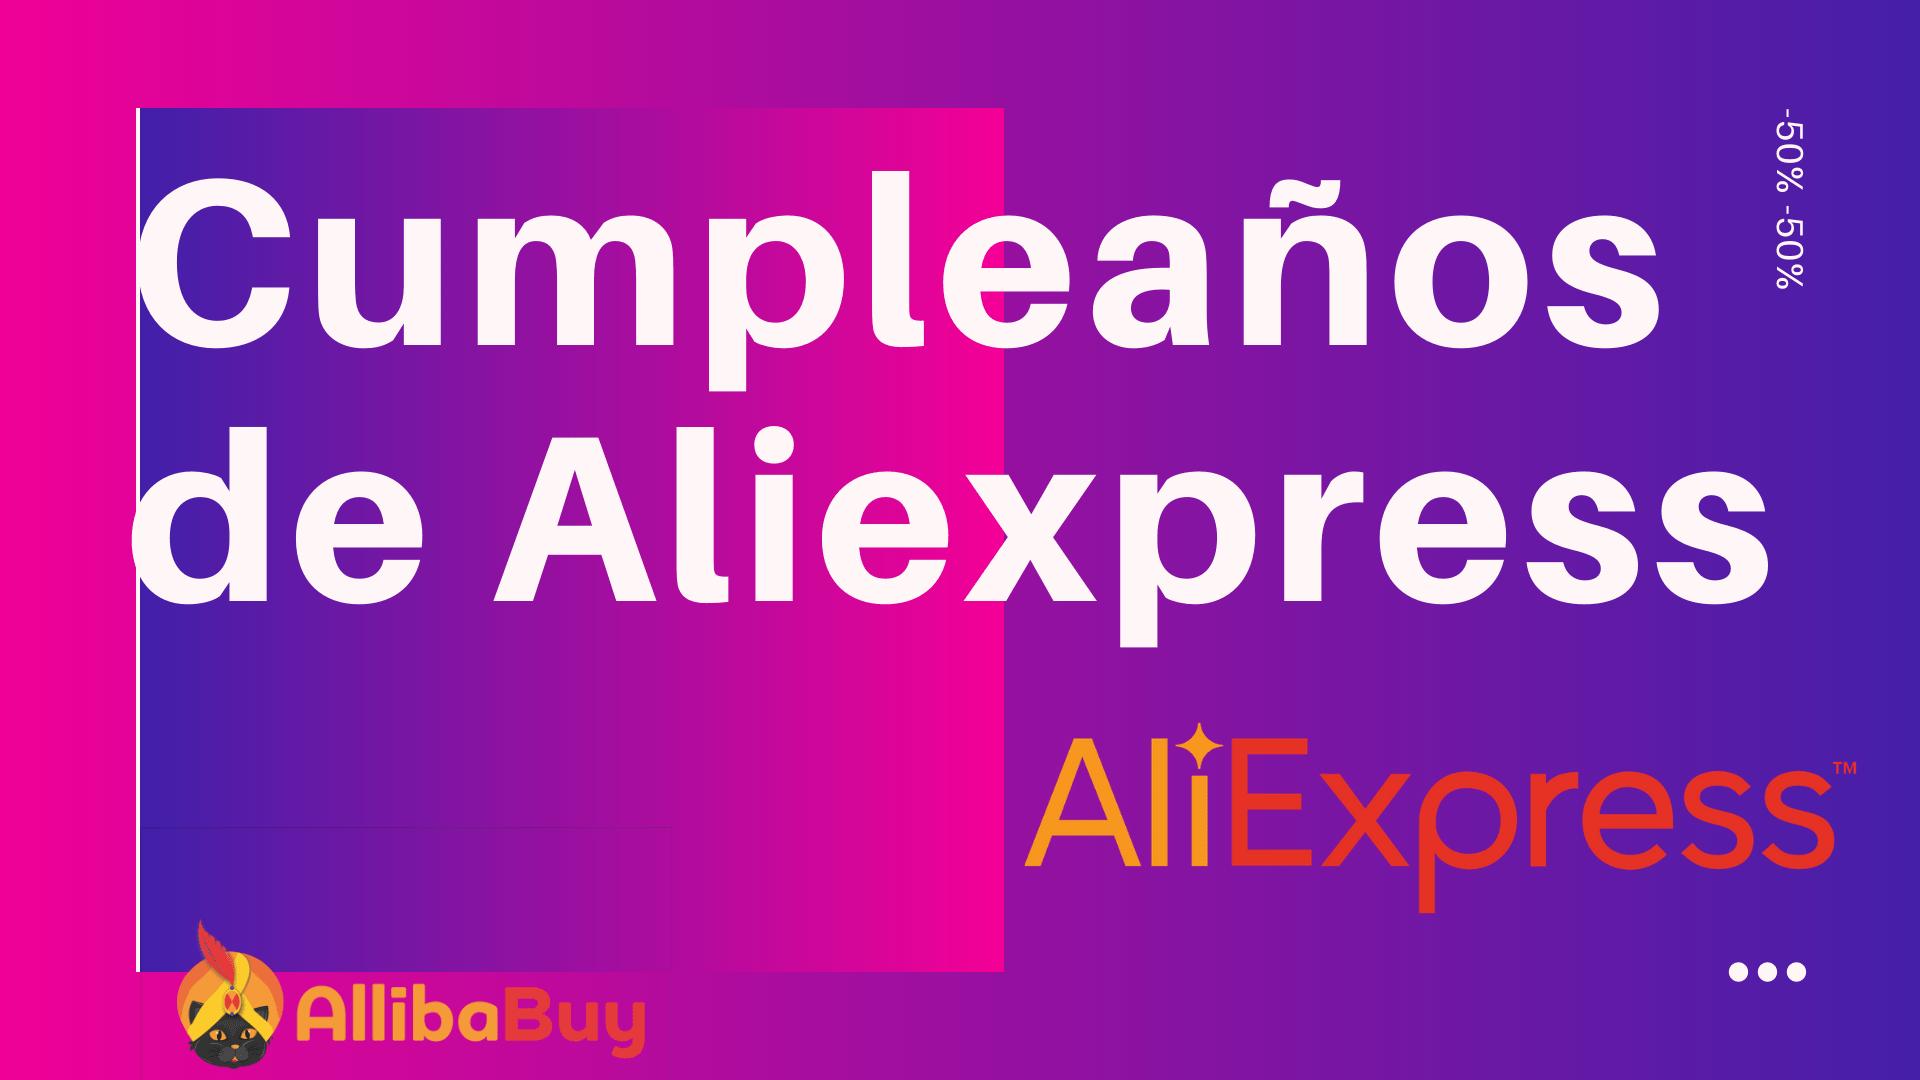 Cumpleaños de Aliexpress en 2020